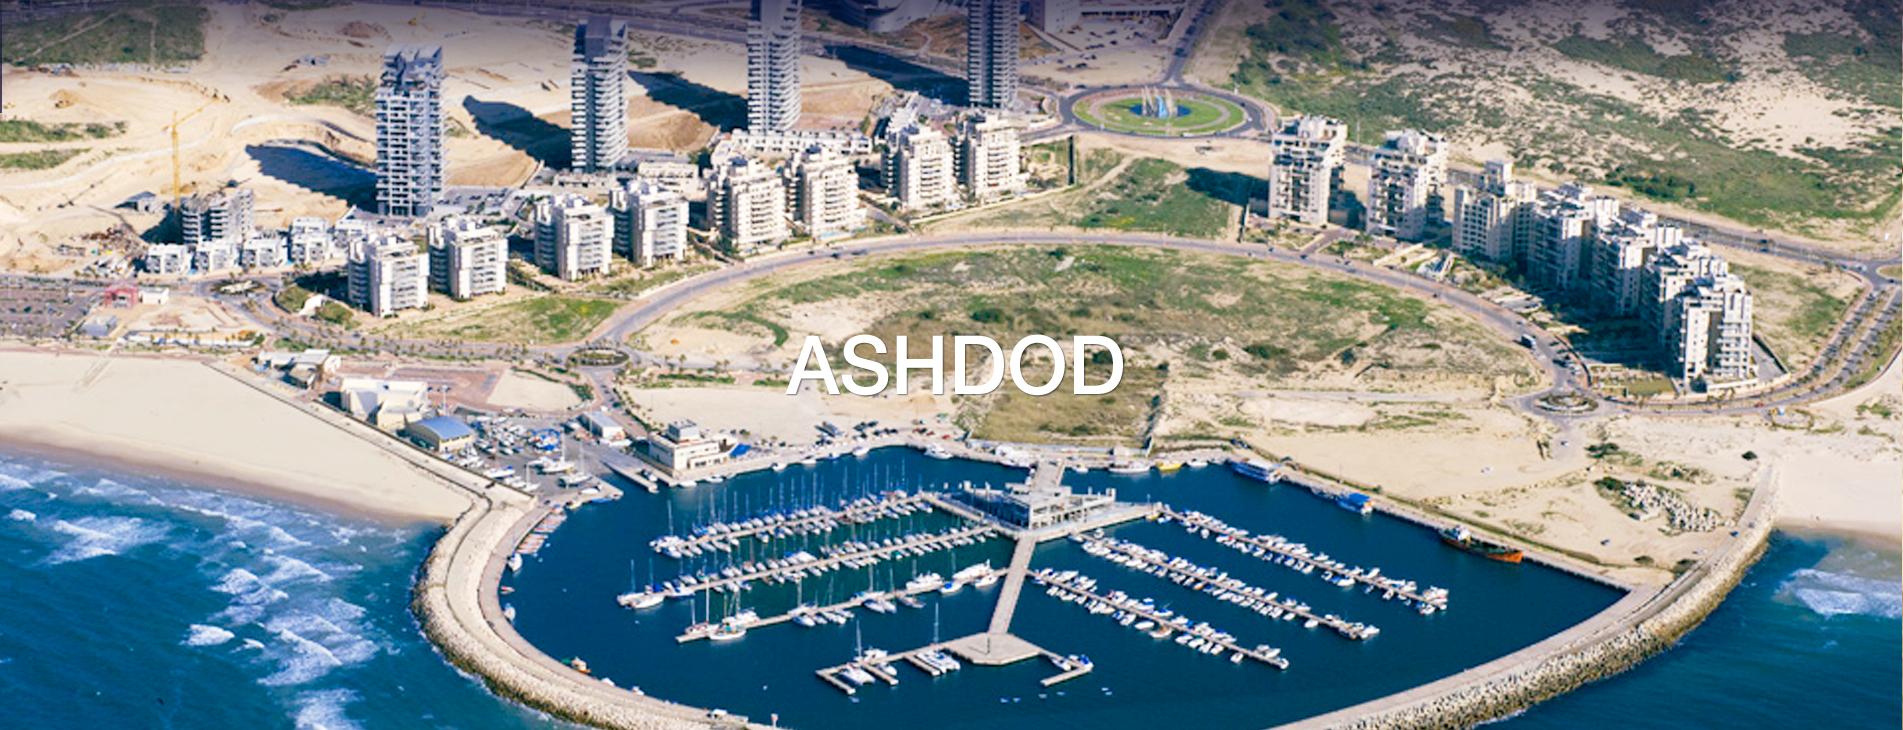 ashdod2